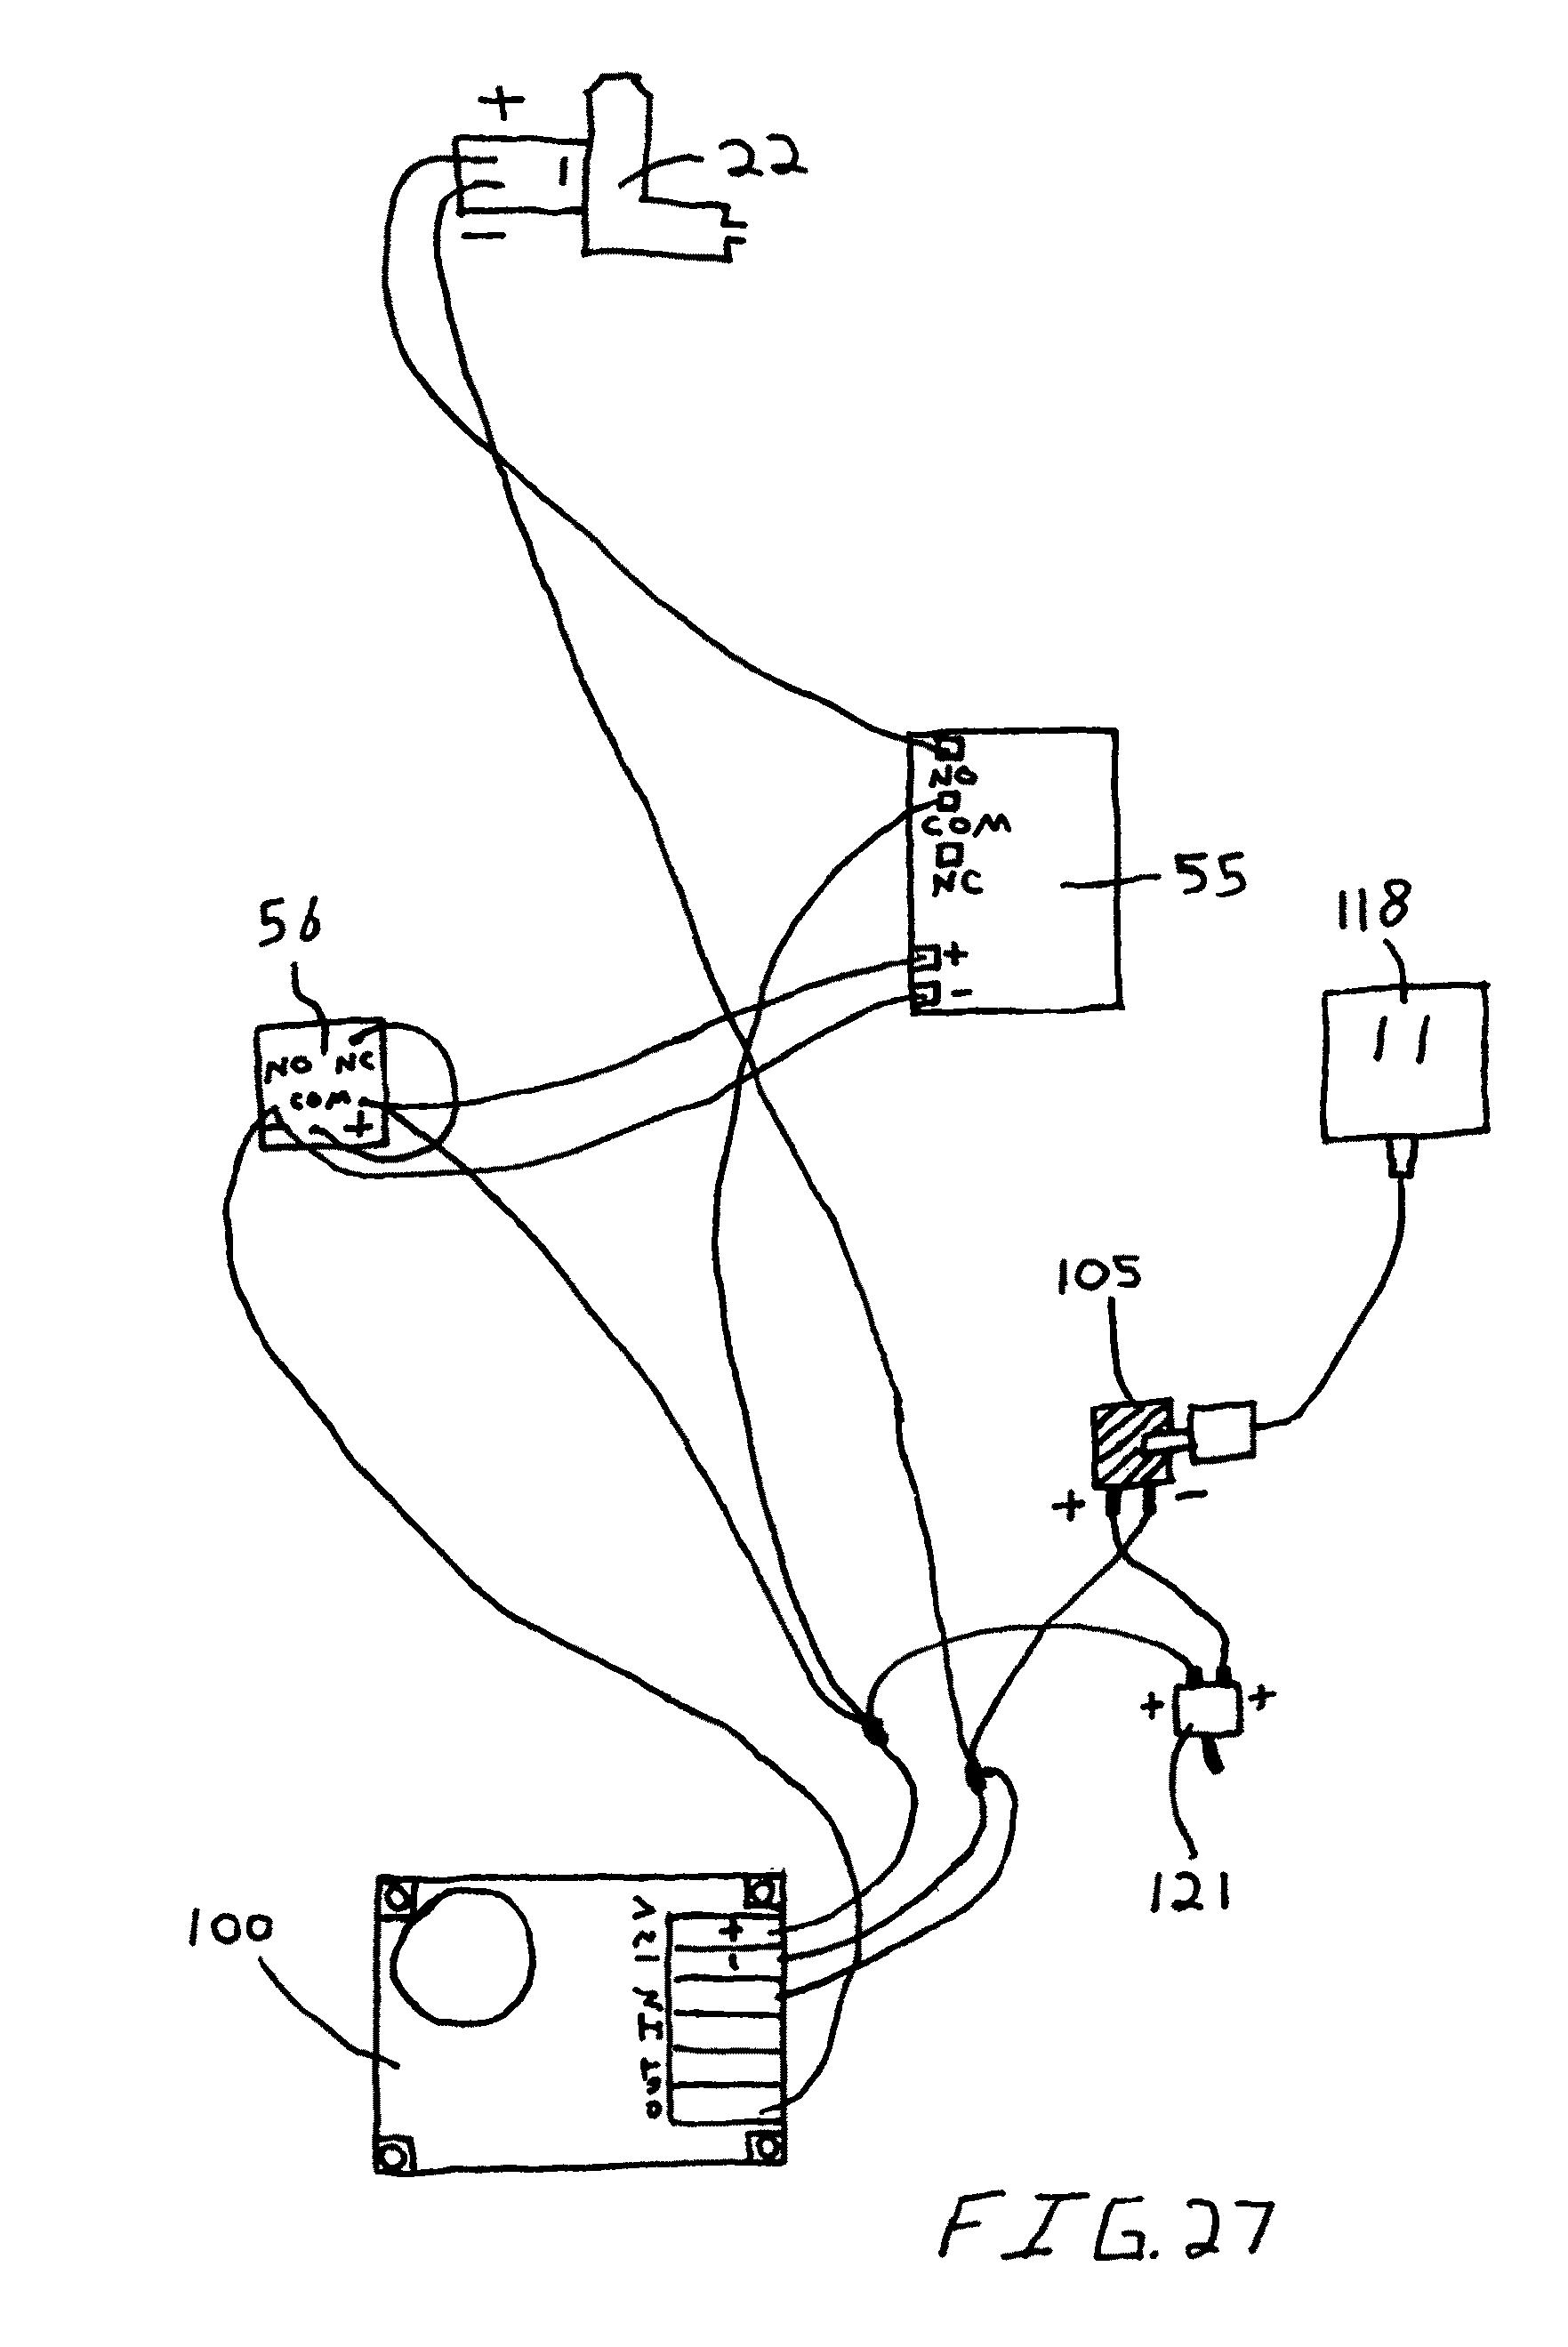 US07878878 20110201 D00013?resize\\\\\\\\\\\\\\\\\\\\\\\\\\\\\\\=840%2C1257 l15 30 wiring diagram on l15 download wirning diagrams hbl2721 wiring diagram at gsmx.co